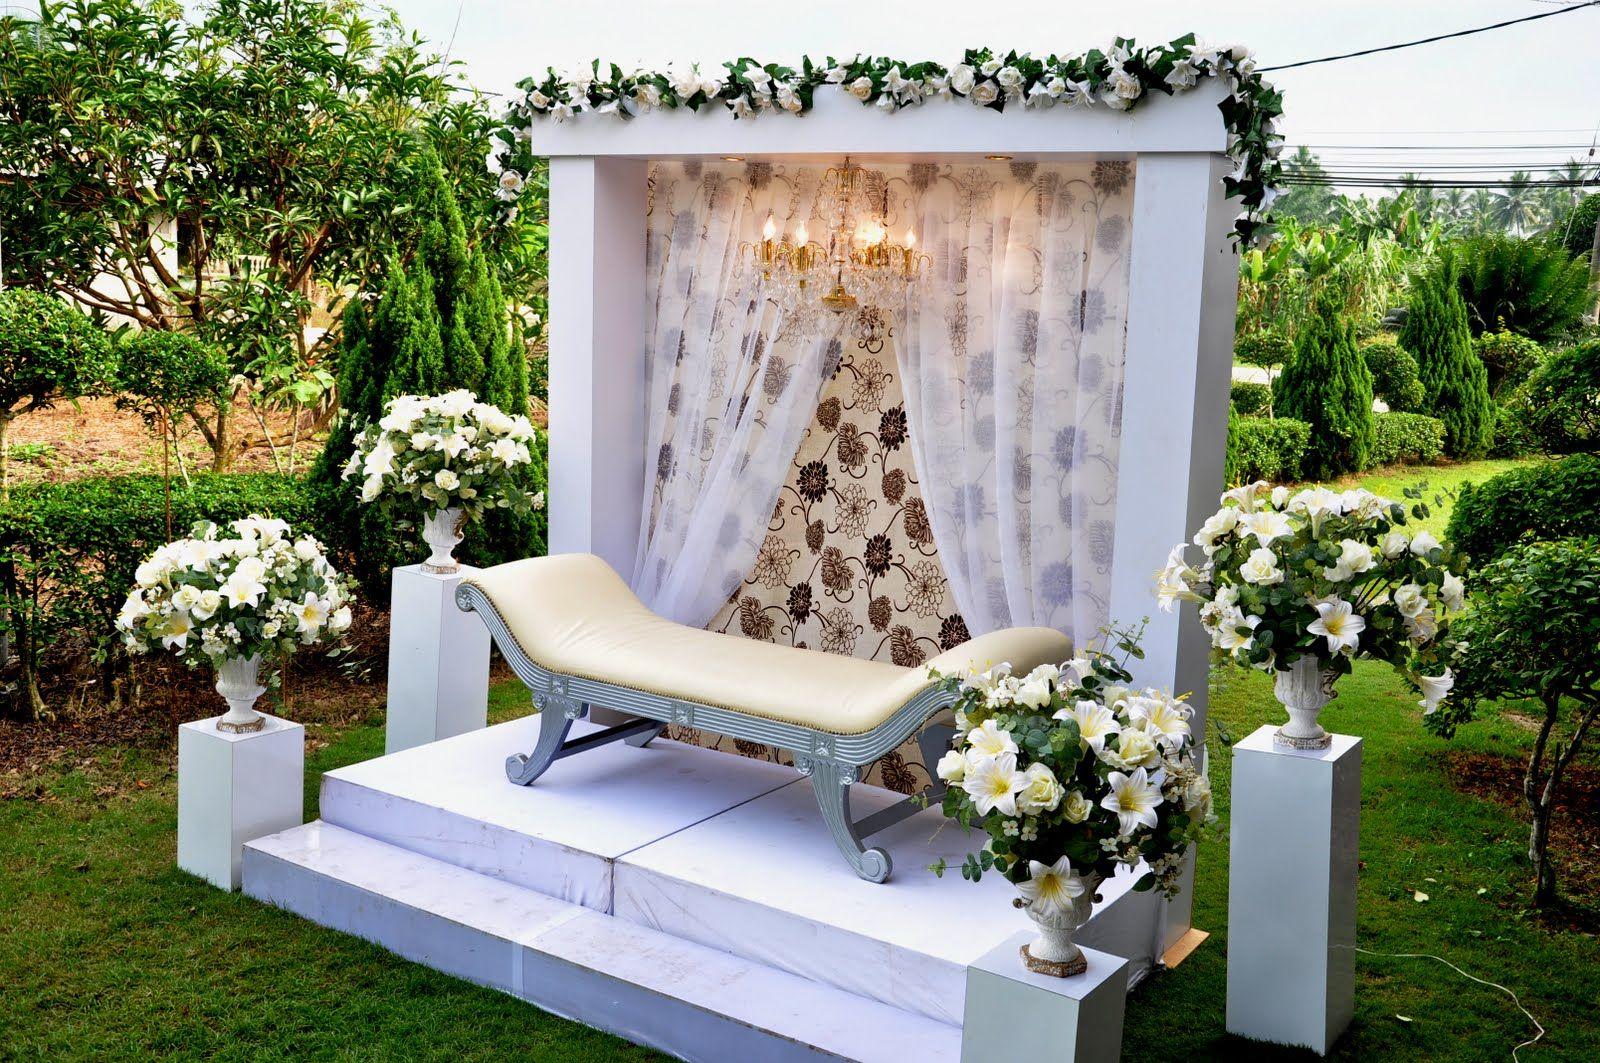 Contoh Foto Pelamin Garden | Ide perkawinan